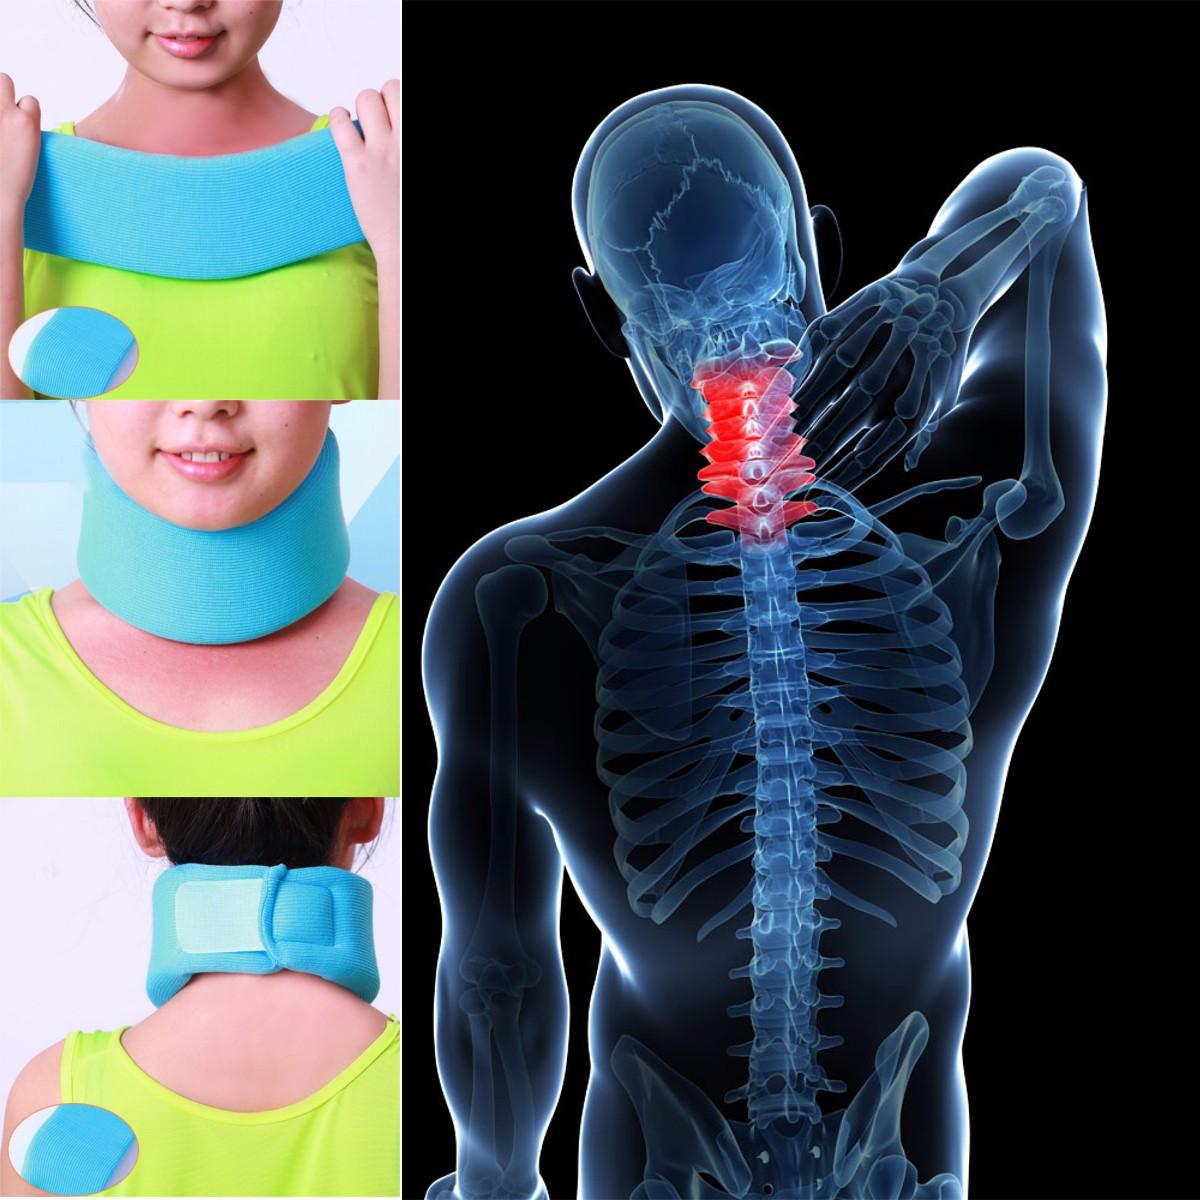 Sponge Neck Support Brace Cervical Collar For Pain Relief